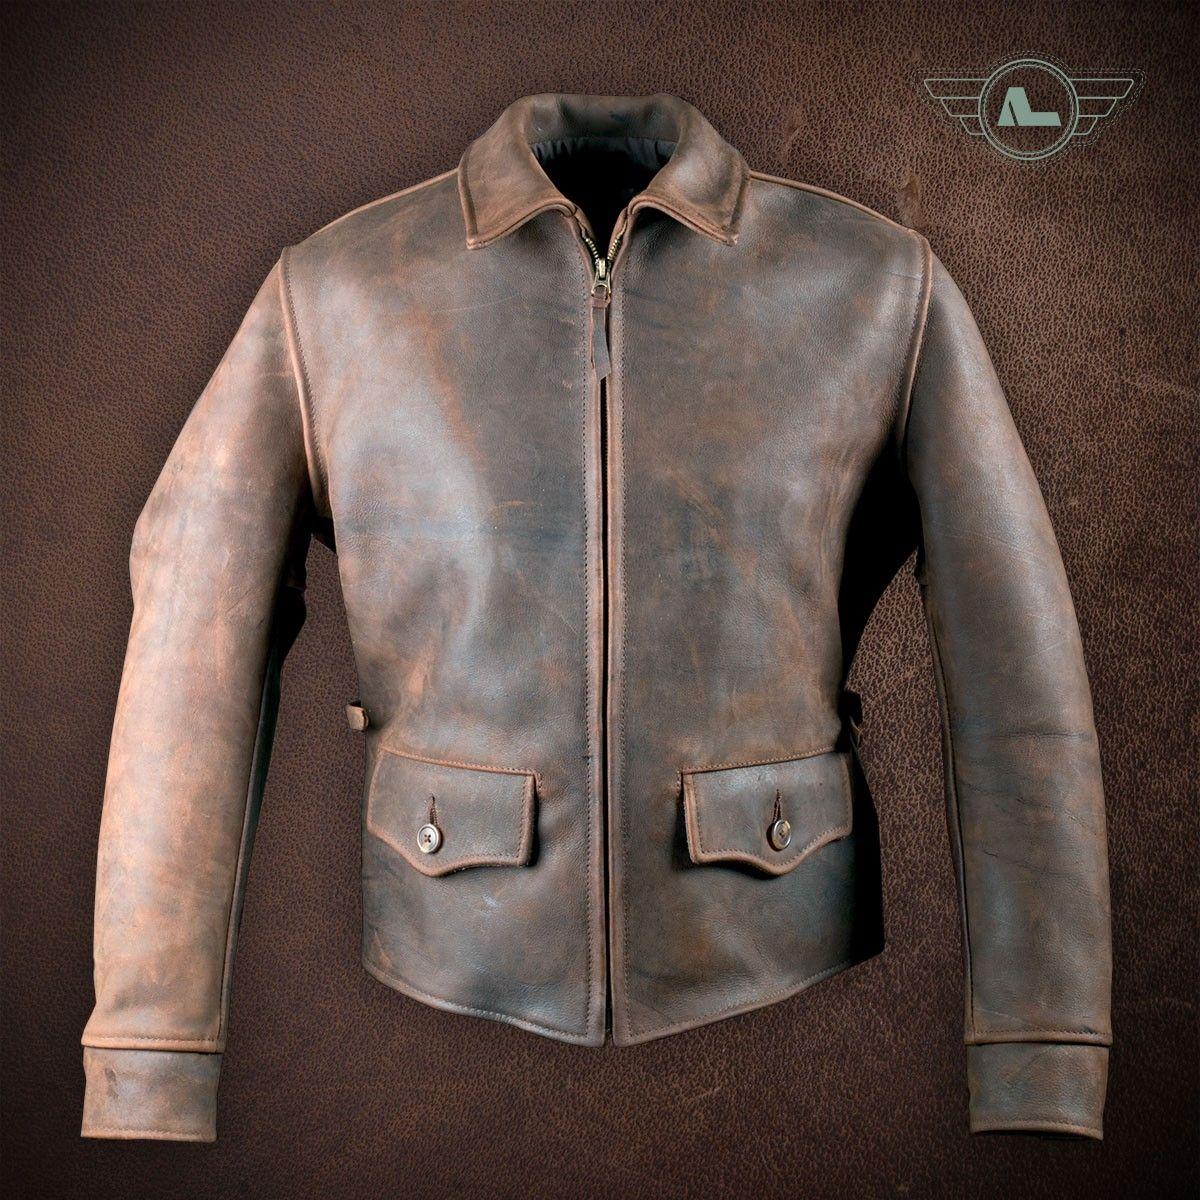 Dakota By Alexander Leathers Vintage Leather Jacket Custom Leather Jackets Leather Jacket Style